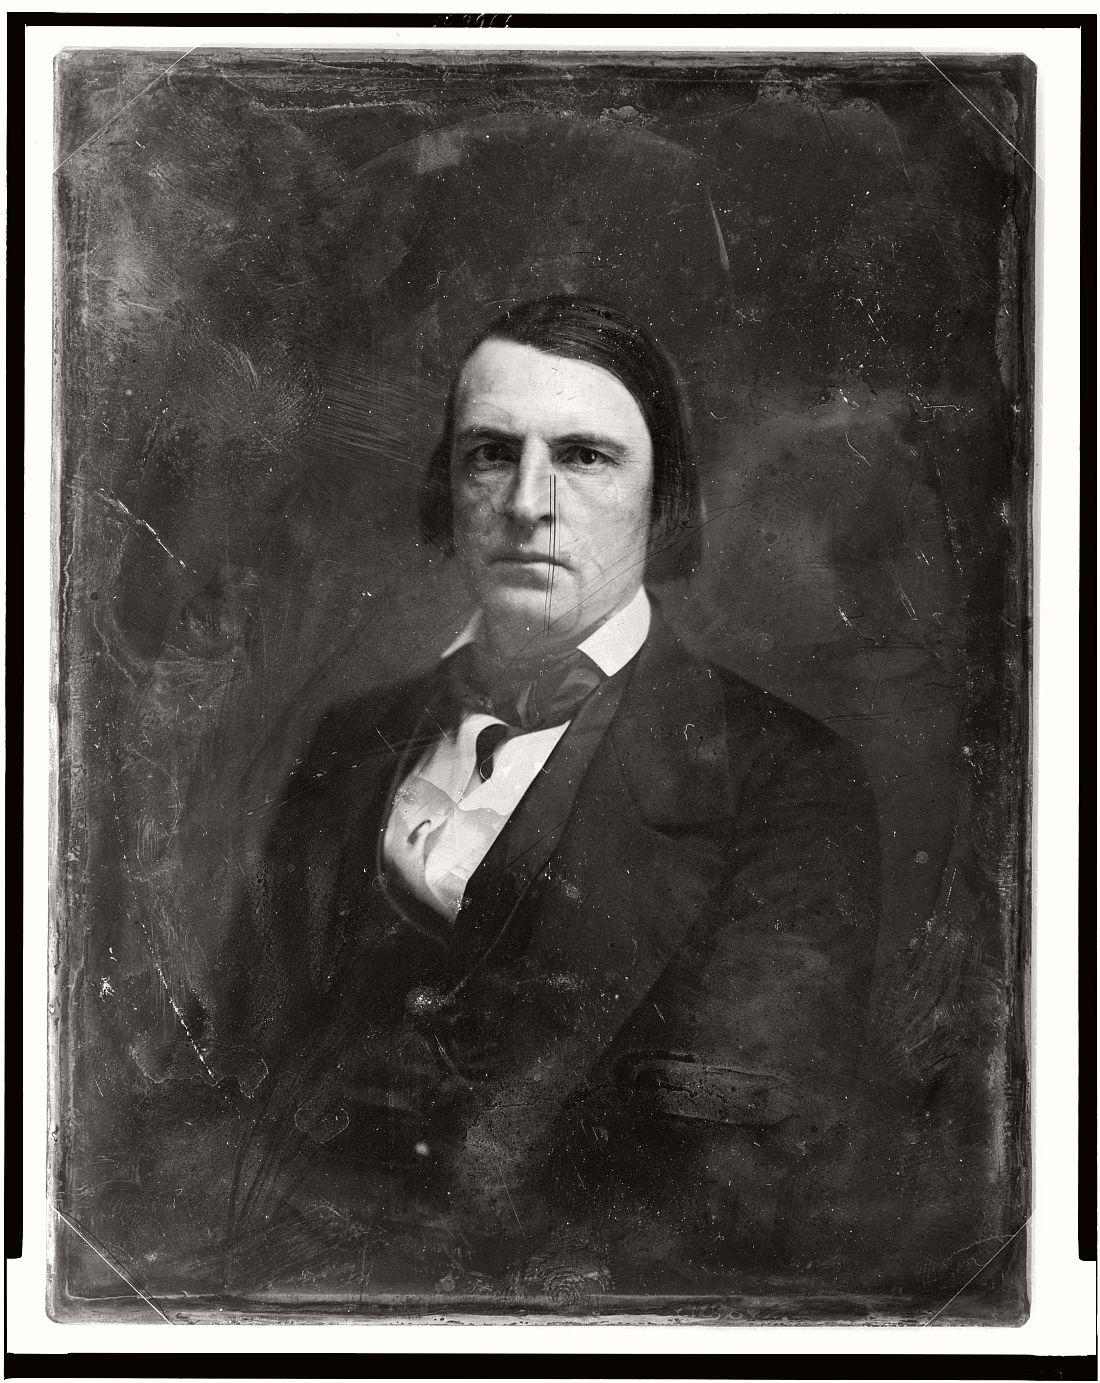 vintage-daguerreotype-portraits-from-xix-century-1844-1860-36